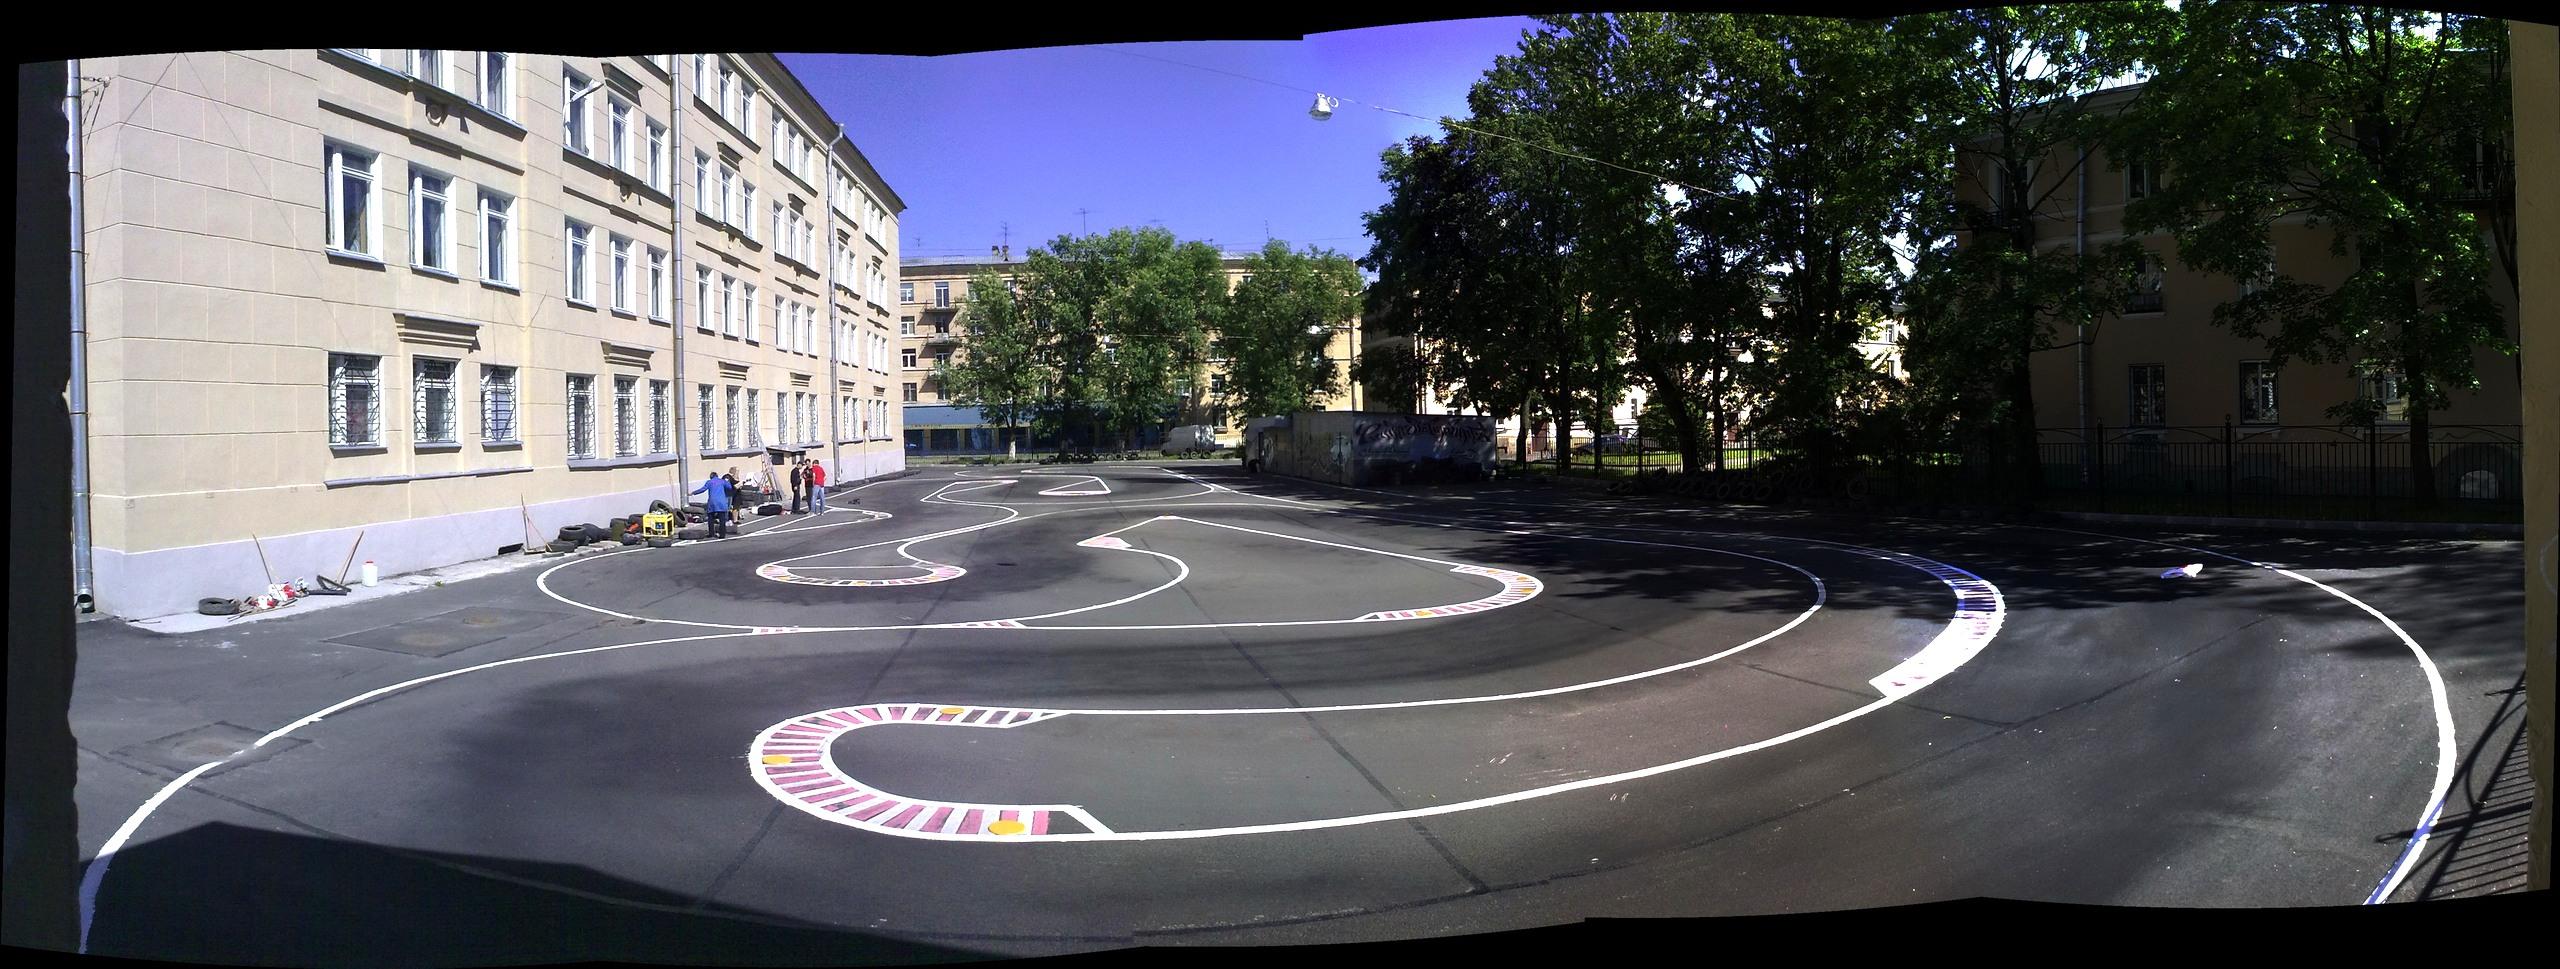 http://img-fotki.yandex.ru/get/4205/turbokisa.9/0_33361_a1bb369b_orig.jpg